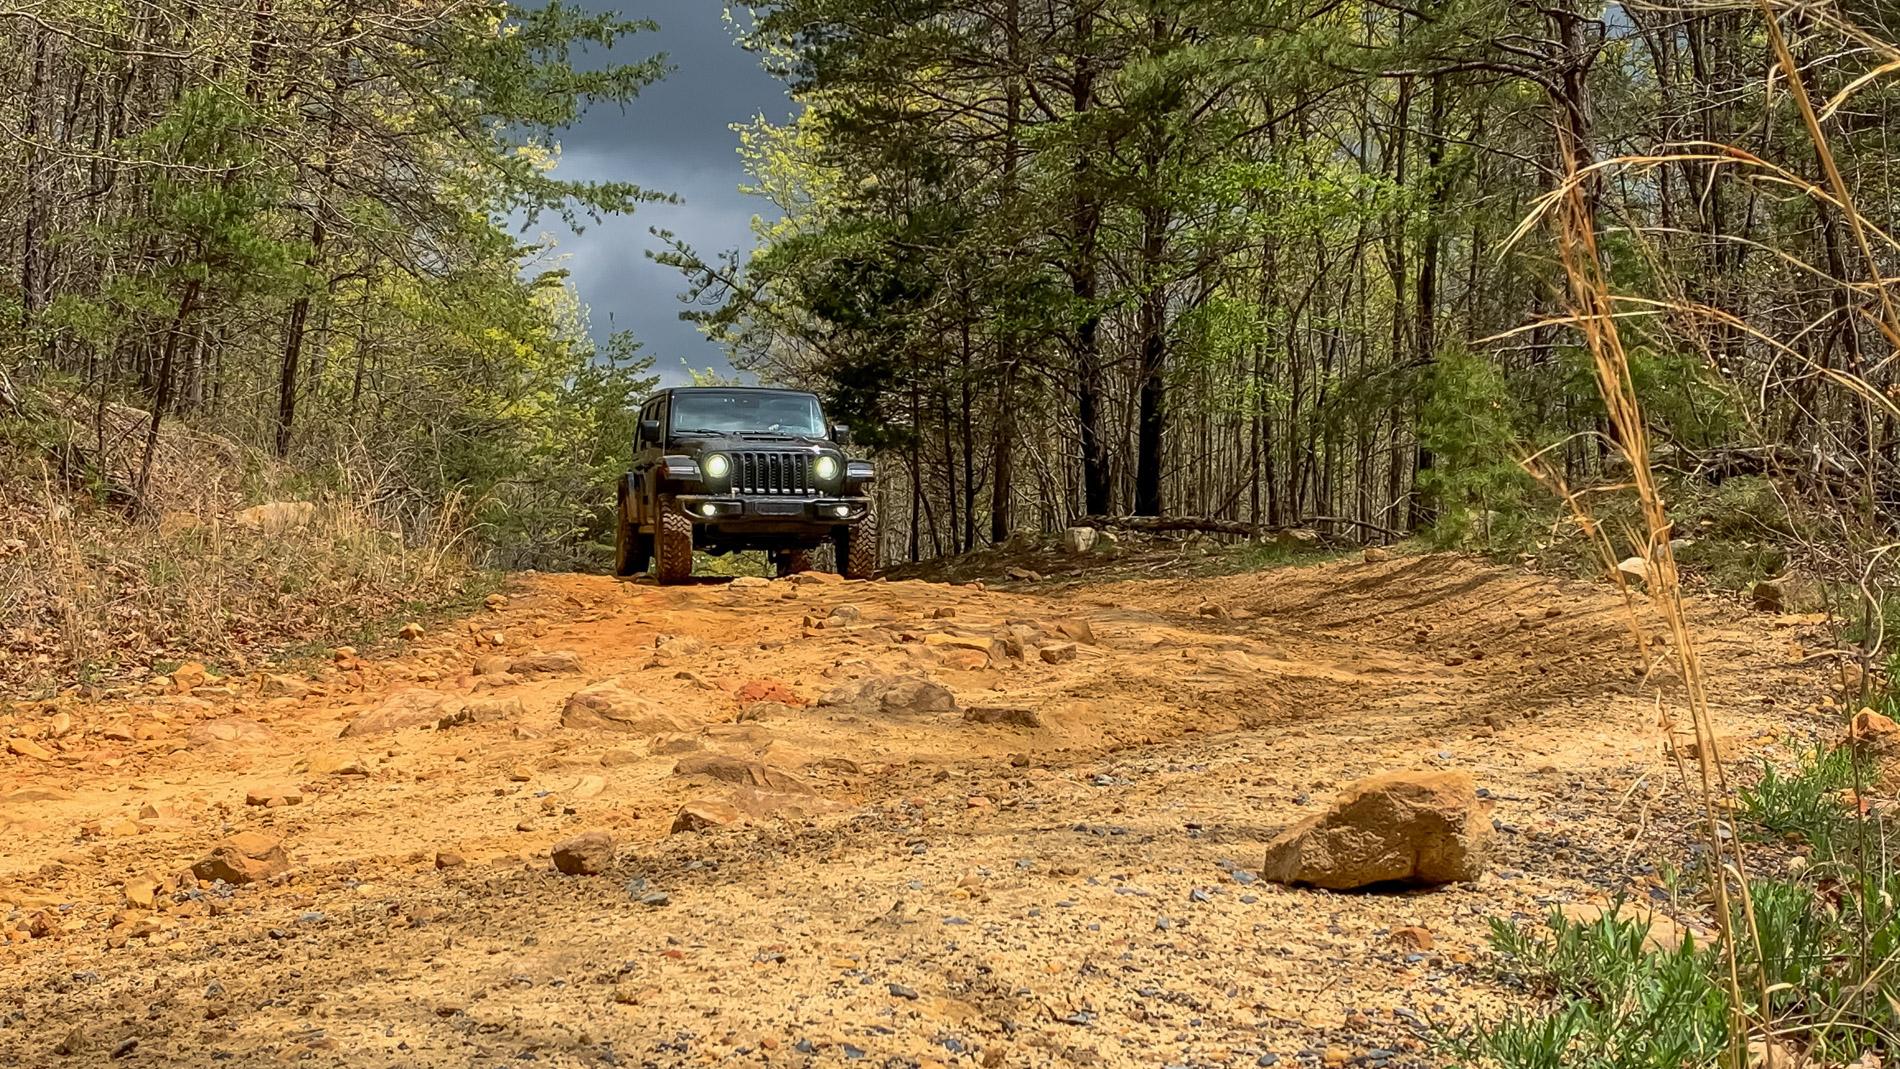 2021 Jeep Wrangler Unlimited Rubicon 392 V8